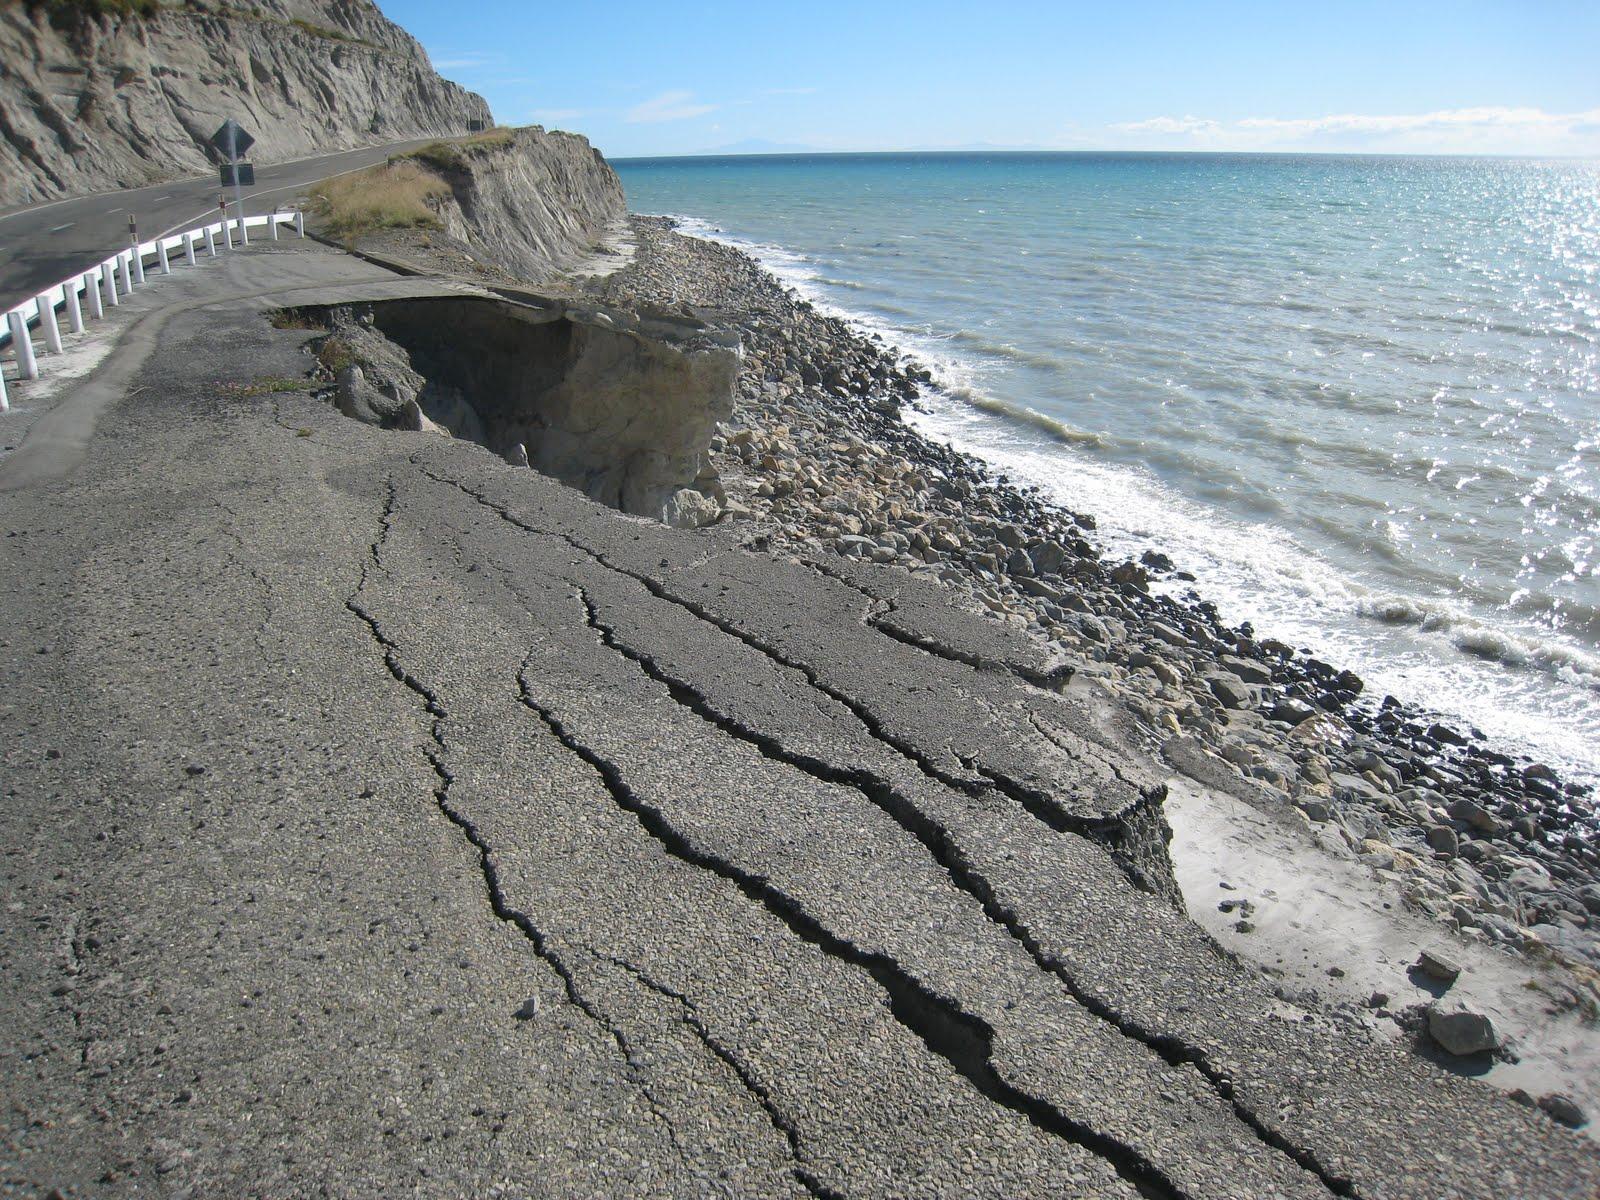 ice erosion pictures - photo #19